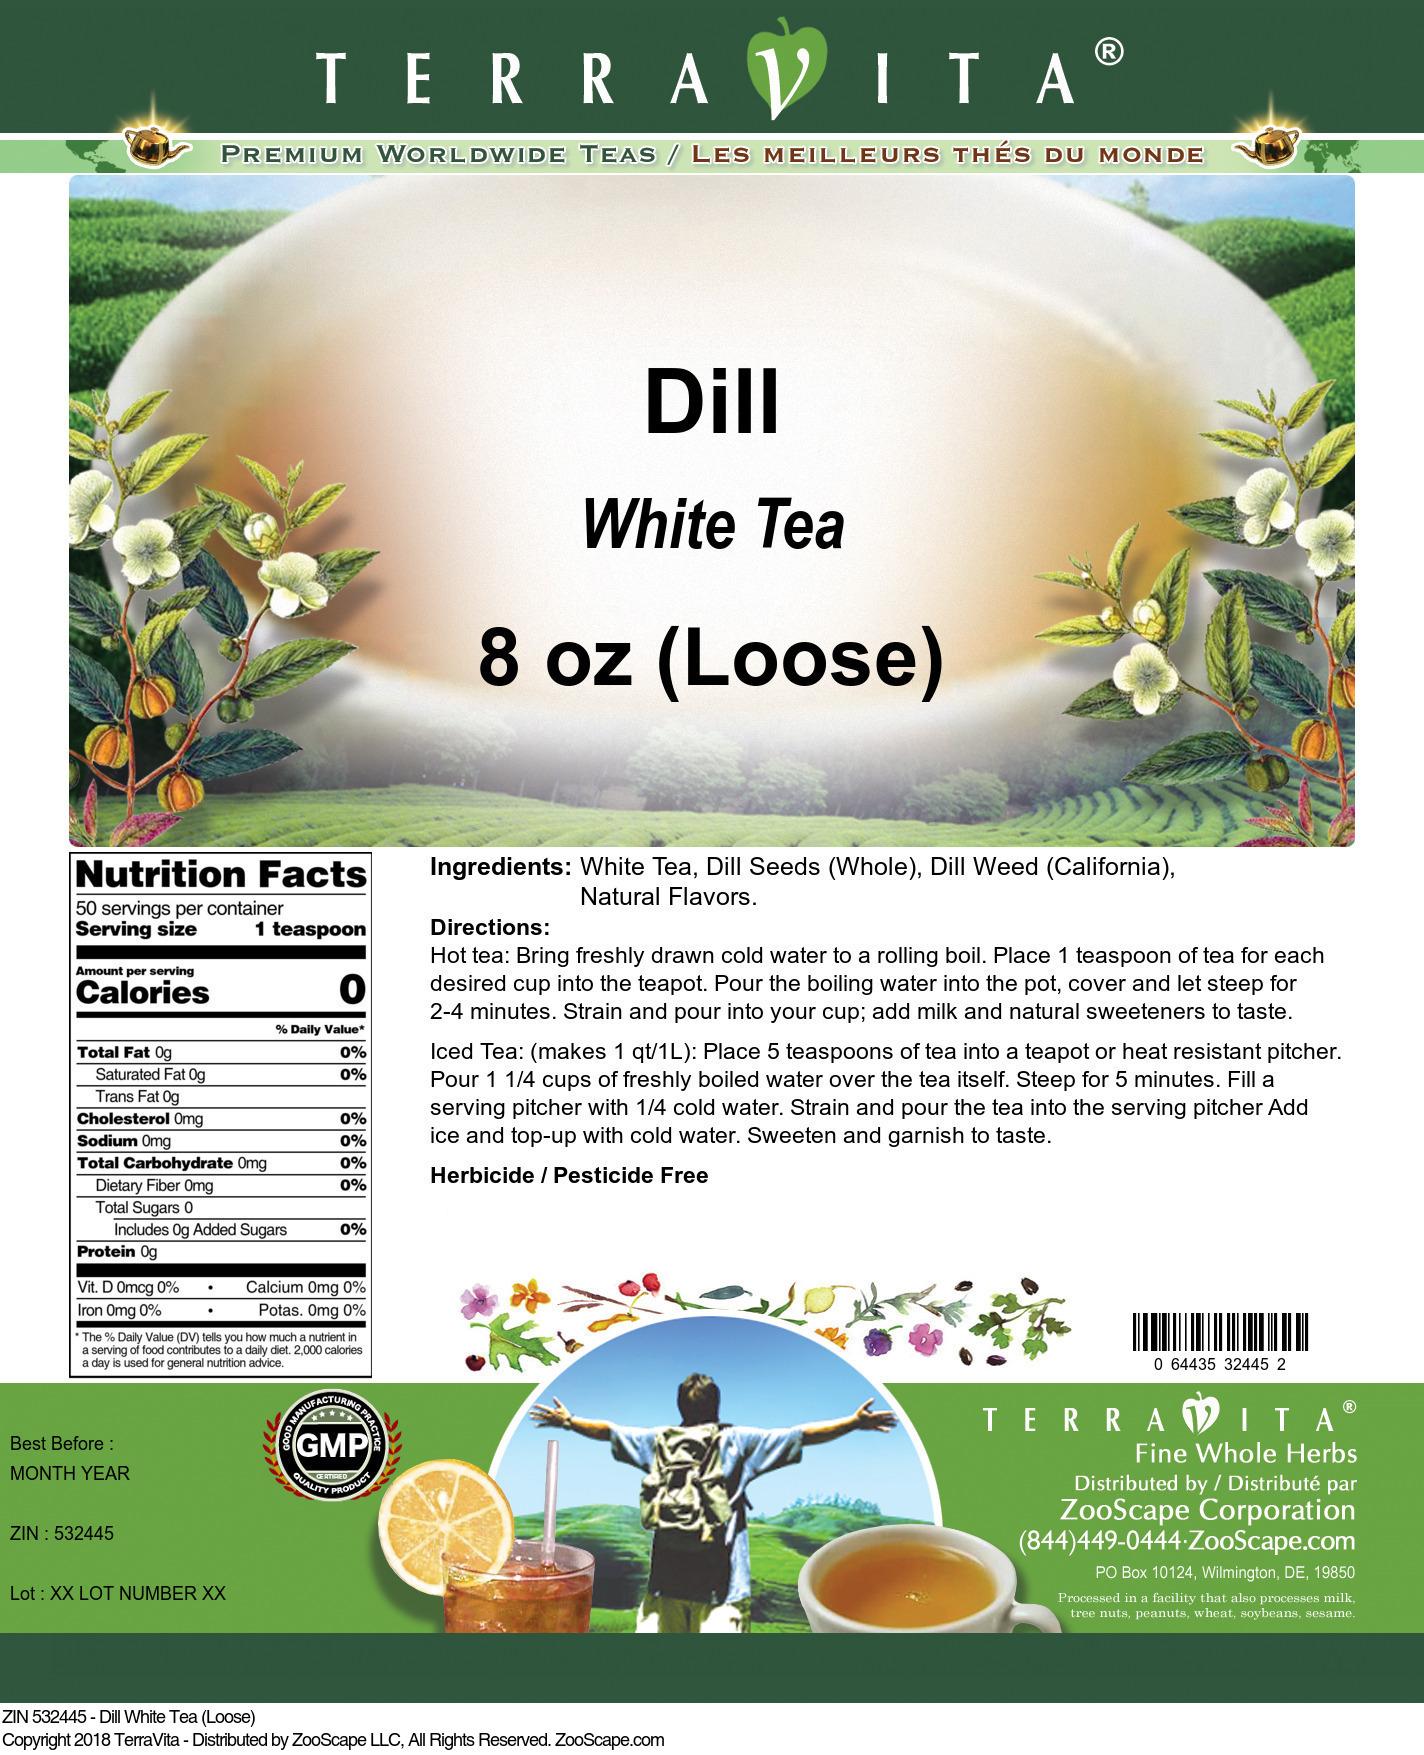 Dill White Tea (Loose)